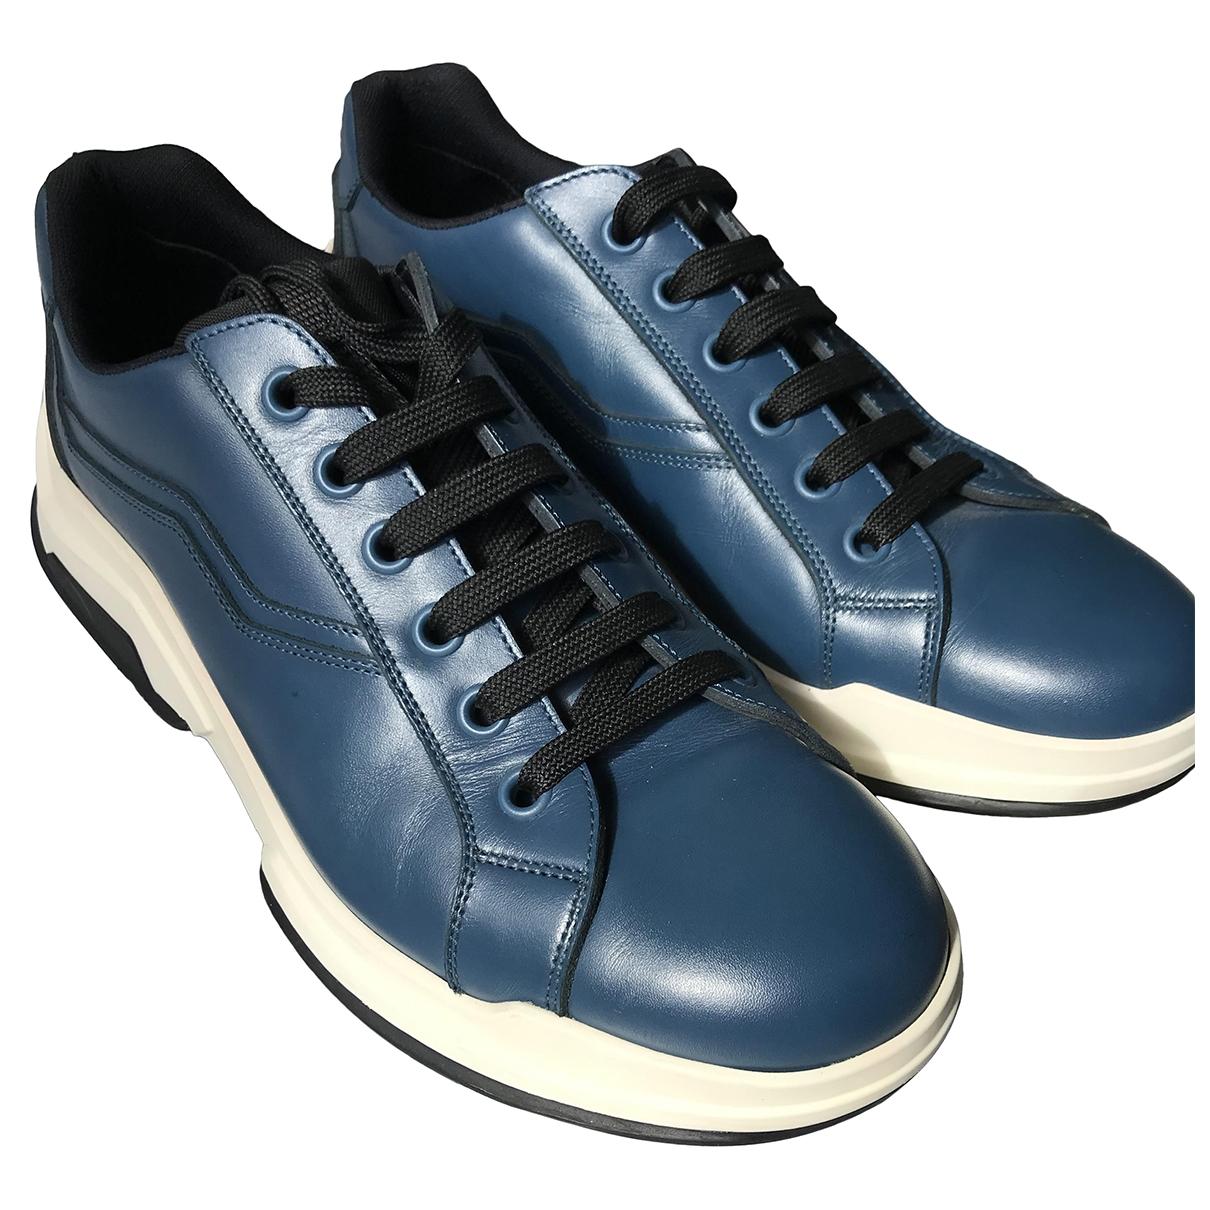 Prada - Baskets   pour homme en cuir - bleu